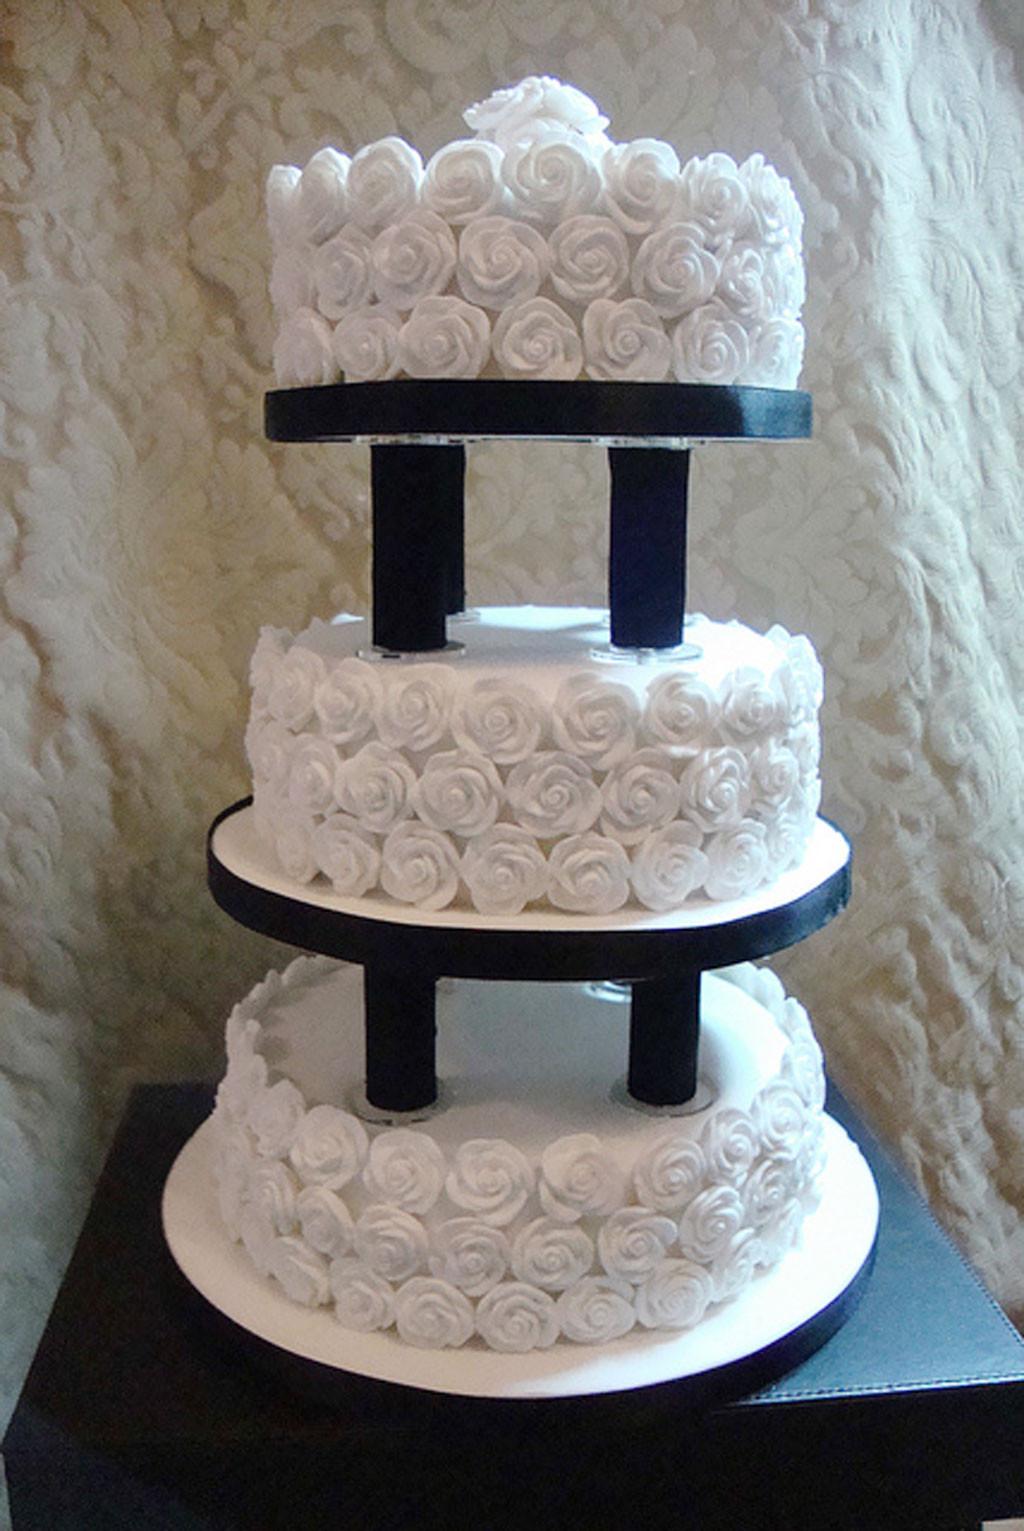 Wedding Cakes Plates  Wedding Cake Pillars And Plates Wedding Cake Cake Ideas